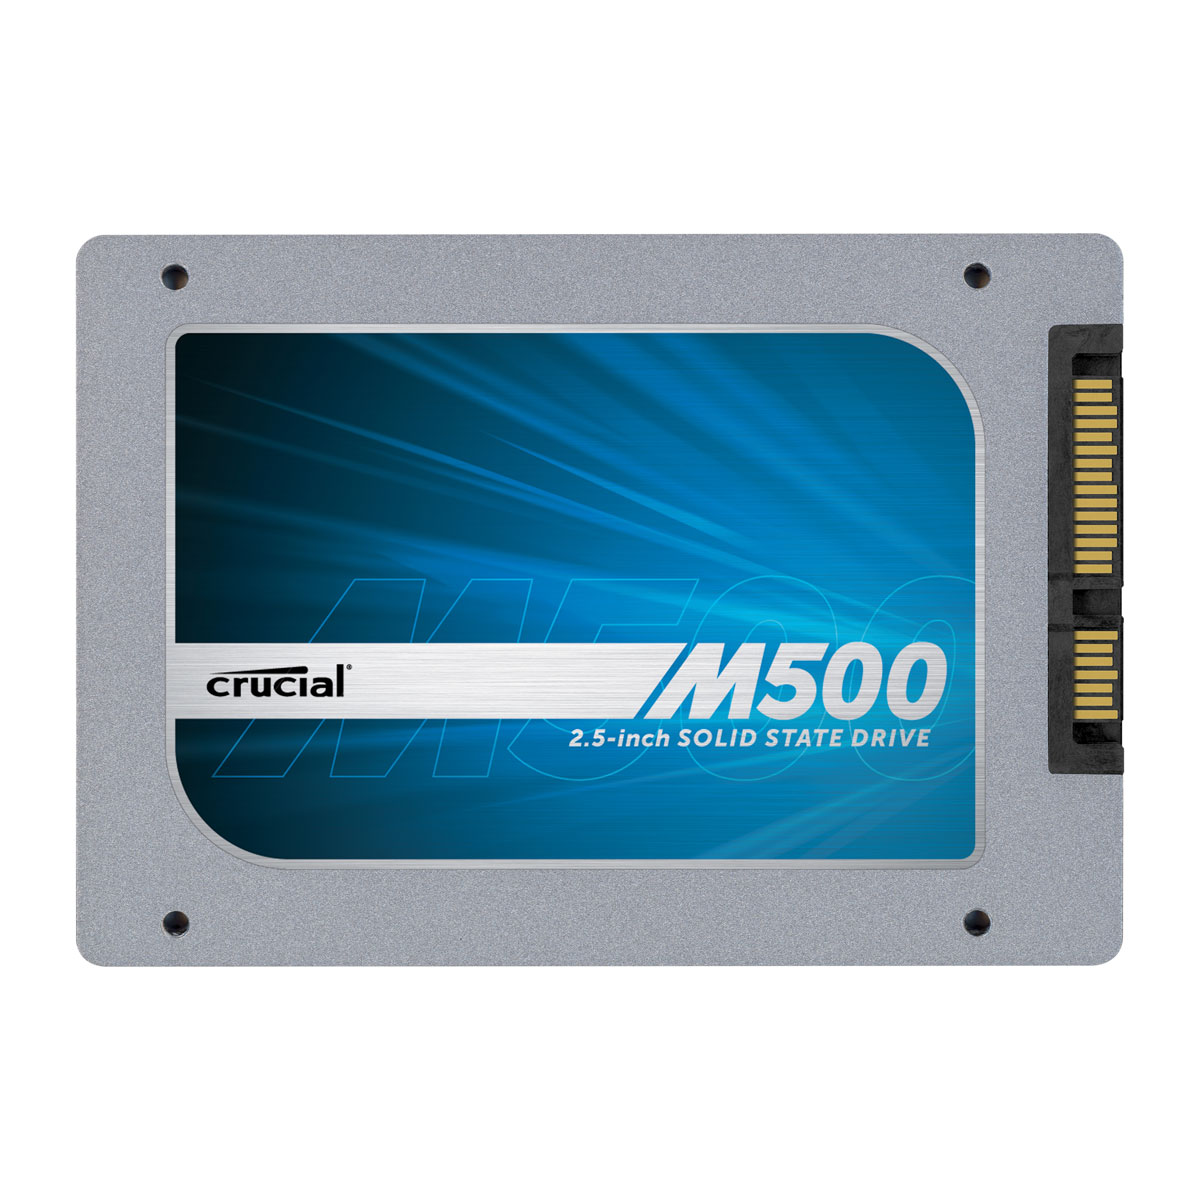 "Disque SSD Crucial M500 120 Go SSD 120 Go 2.5"" 7mm Serial ATA 6Gb/s"